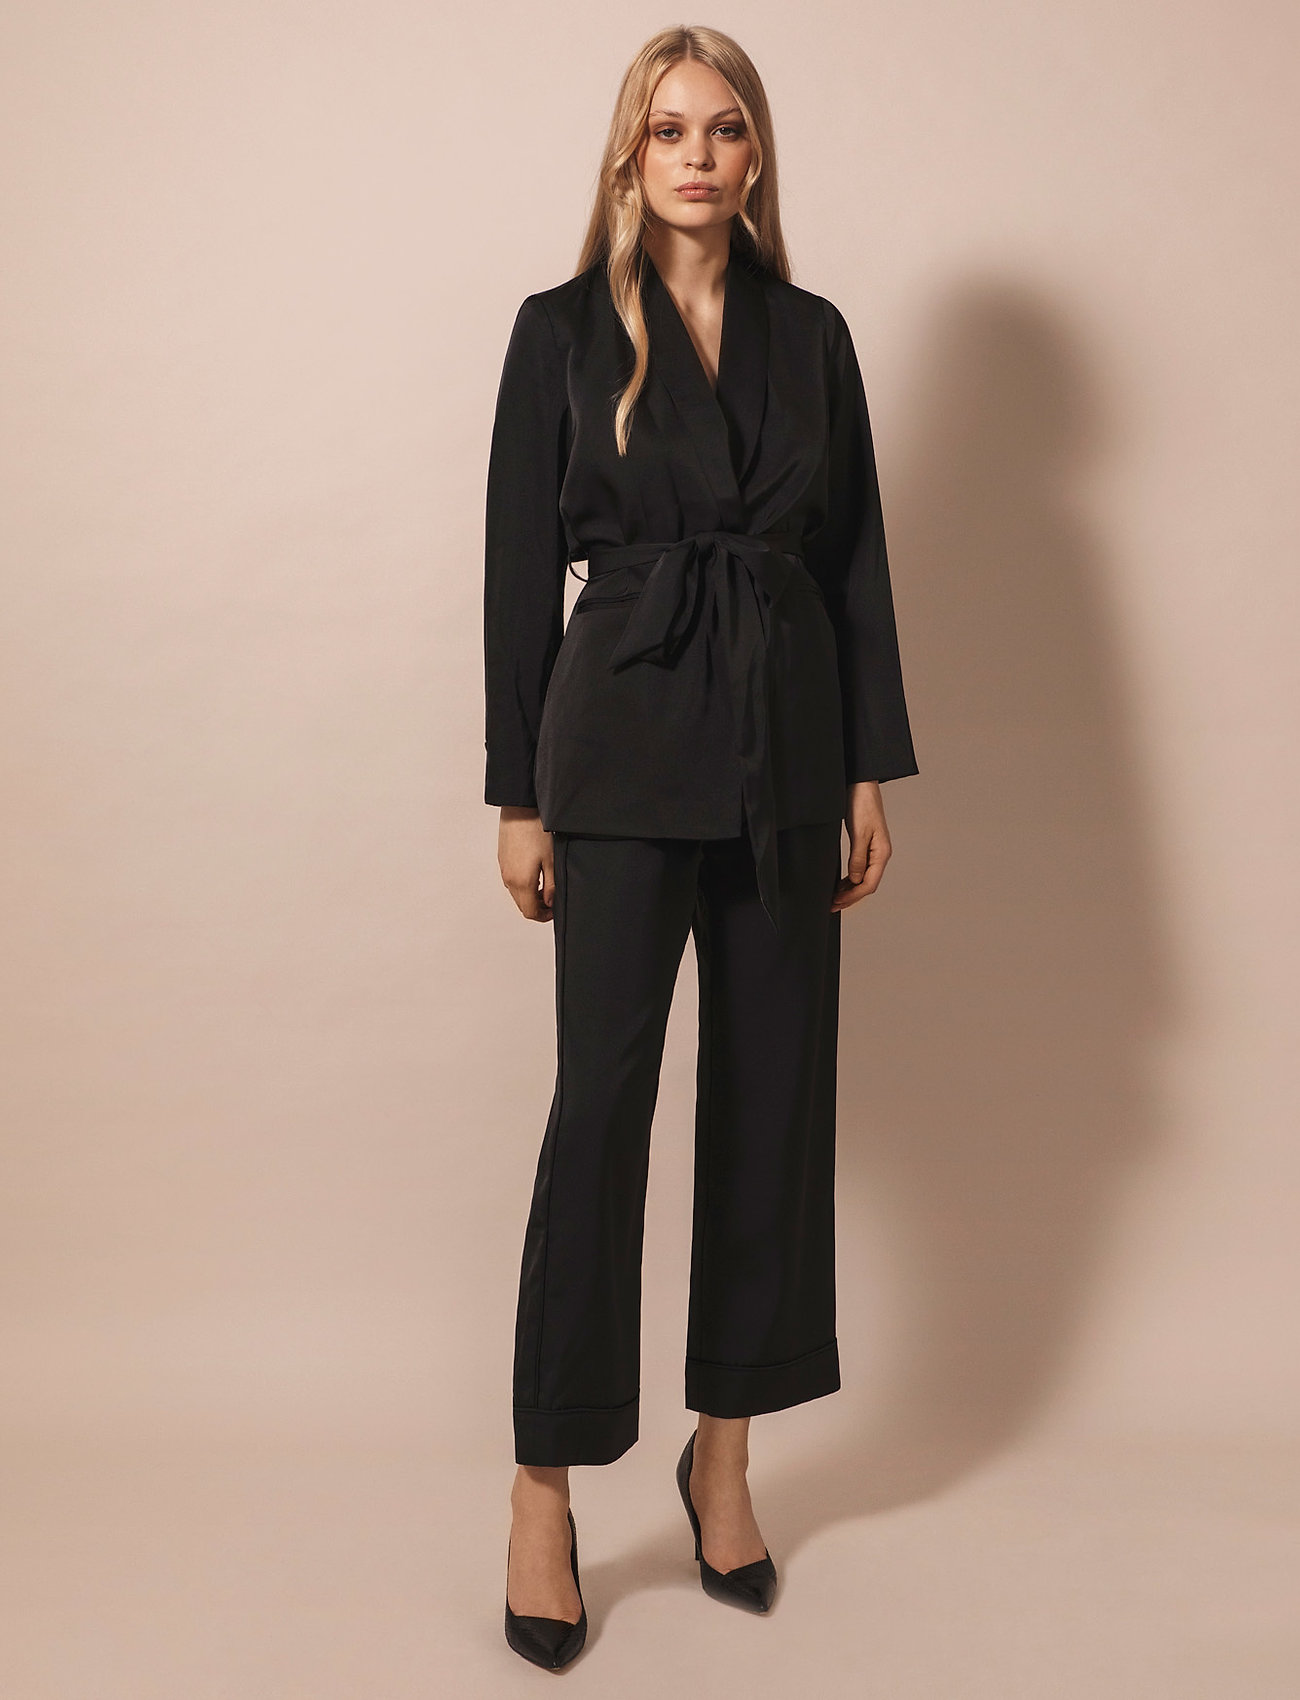 By Malina - Day jacket - kavajer - black - 0